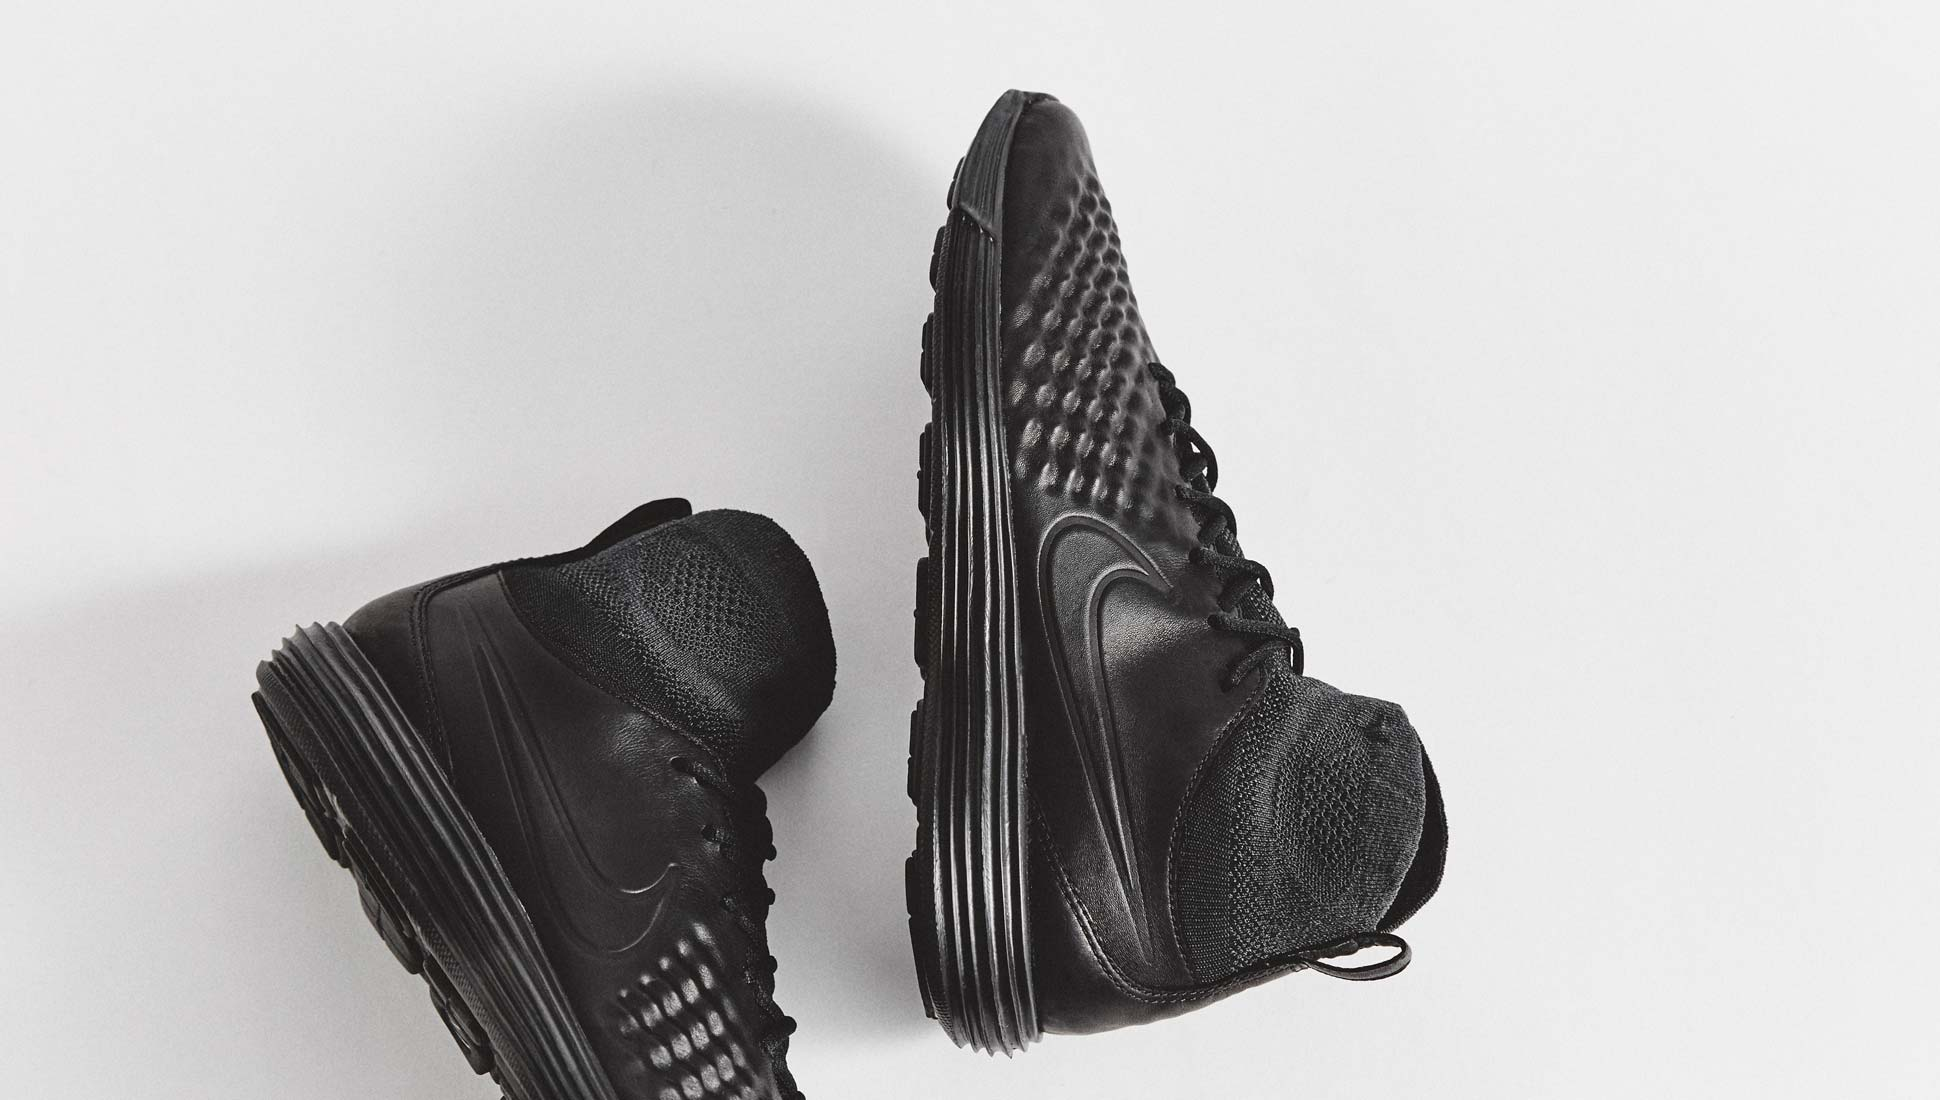 online store 851a0 1b1a0 Nike Lunar Magista II Flyknit Black Sneakers - SoccerBible